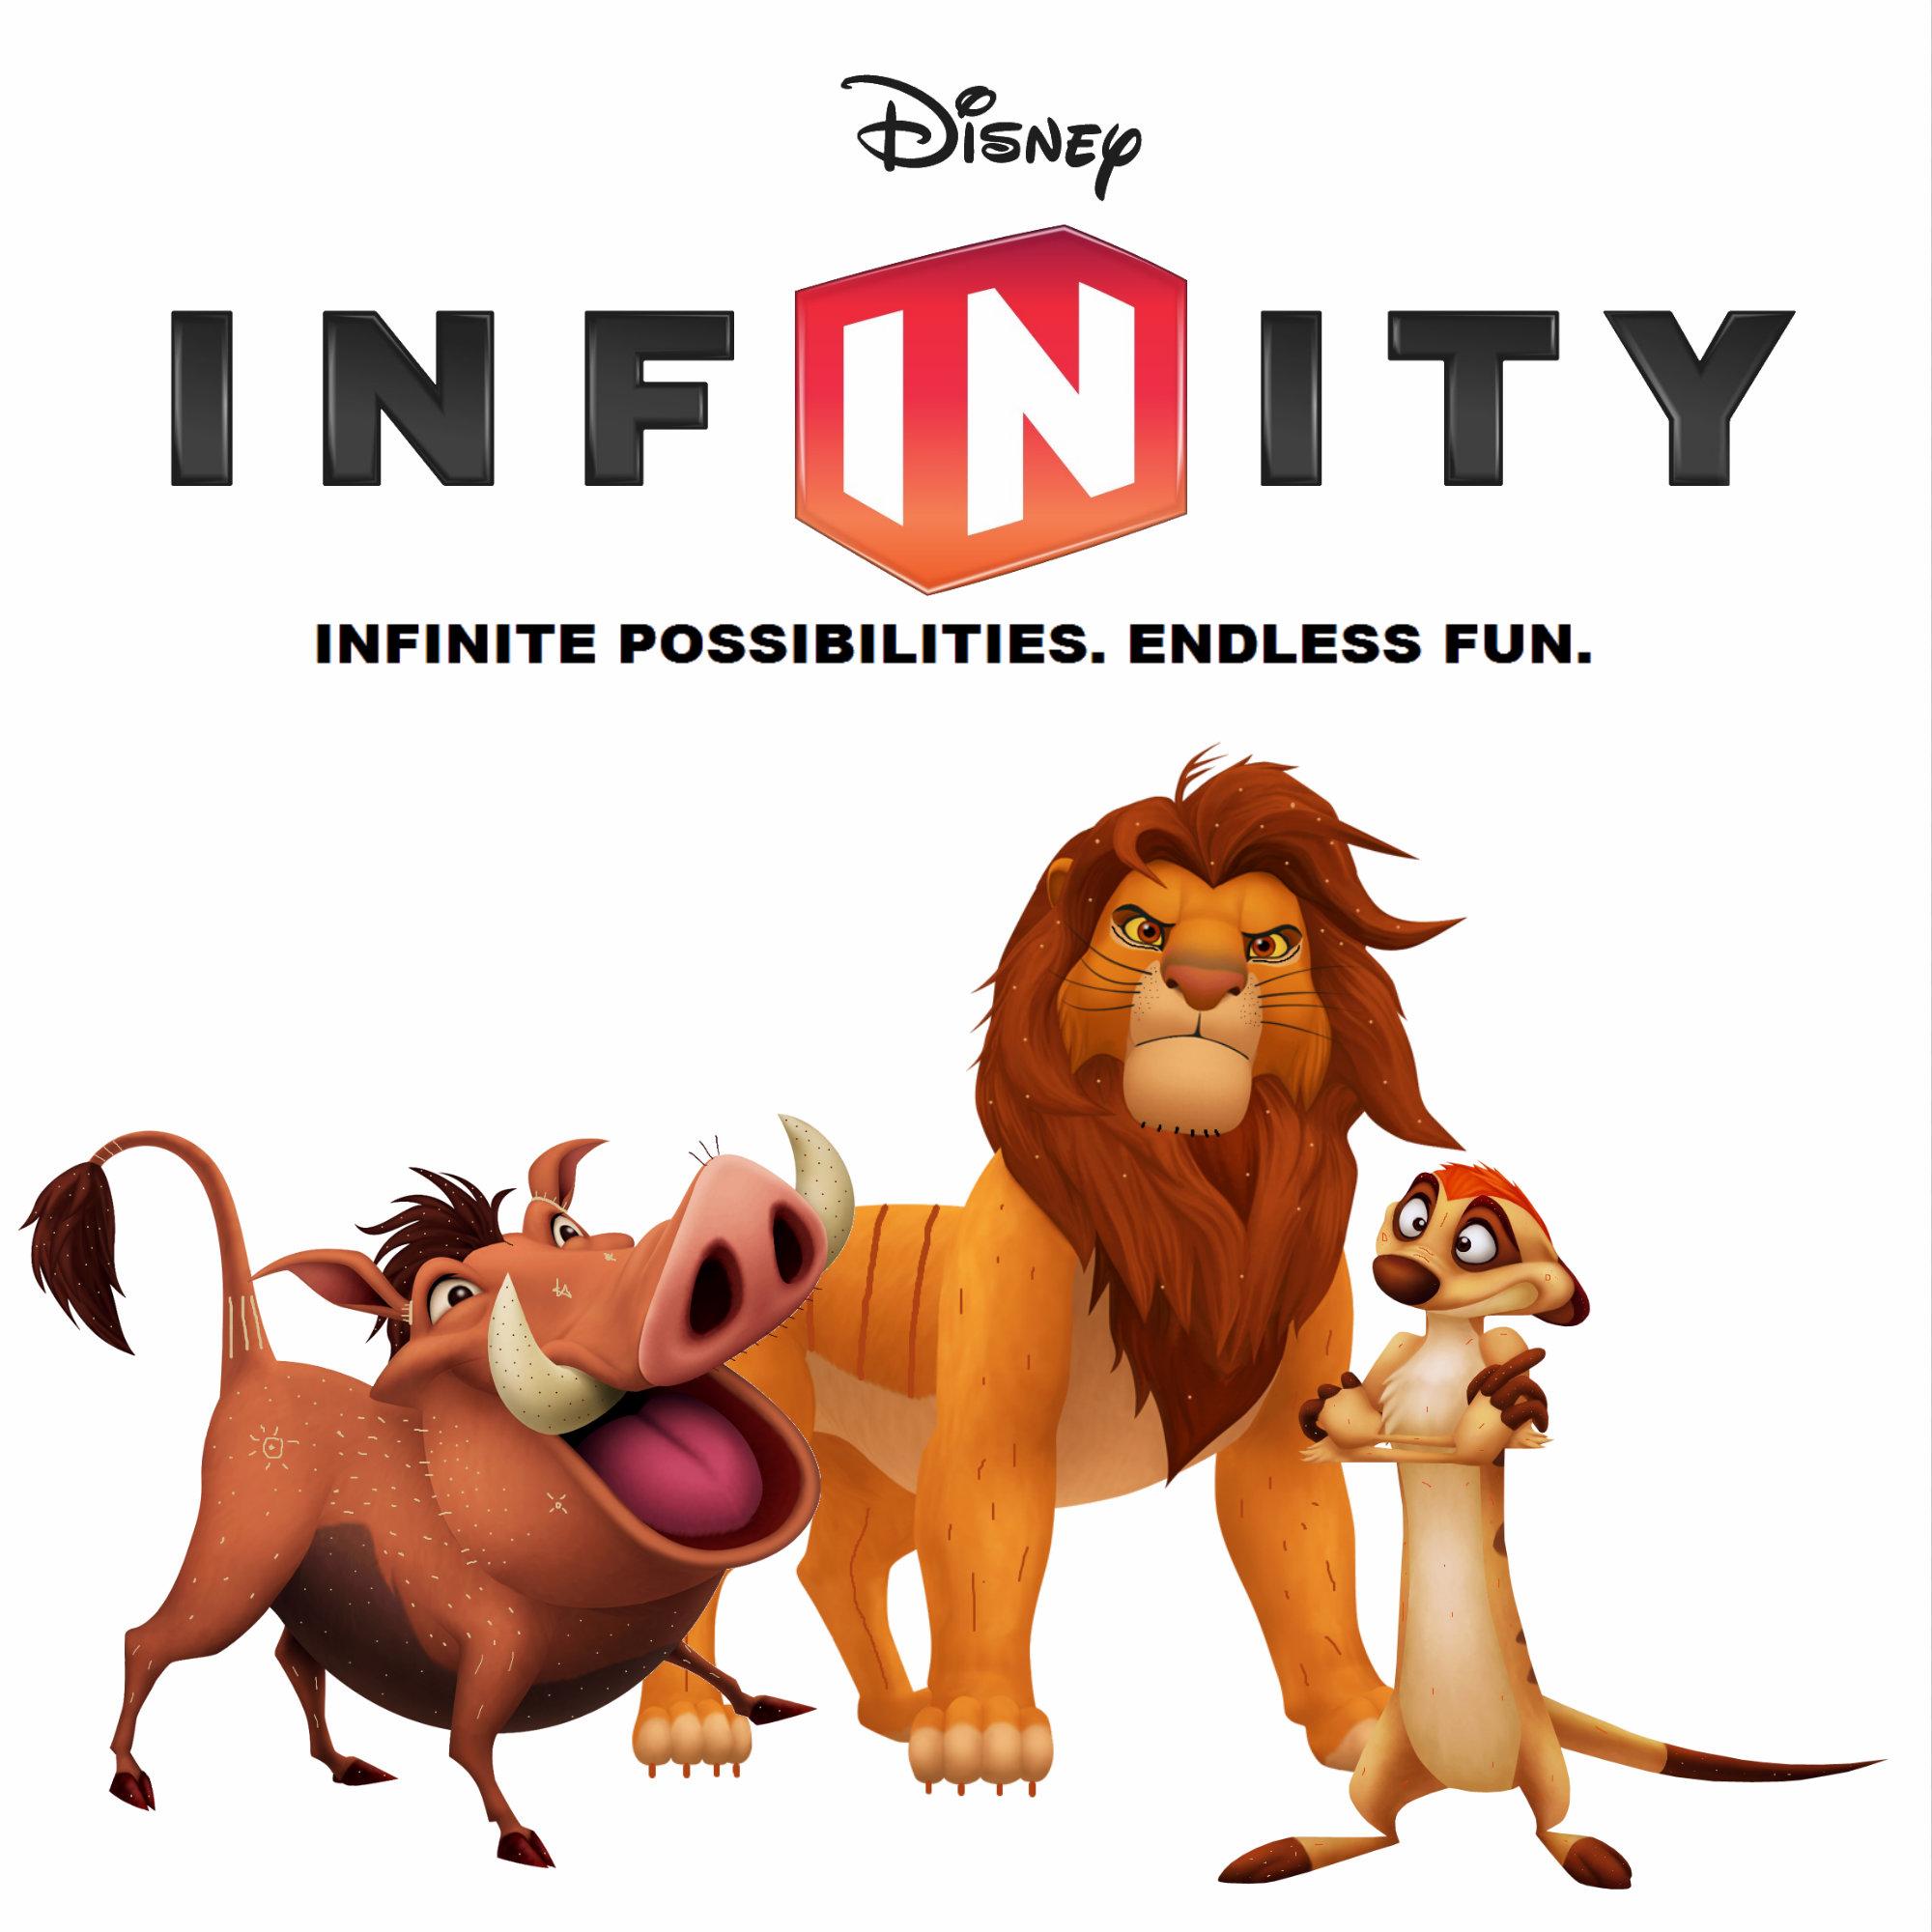 disney infinity lion king - photo #21